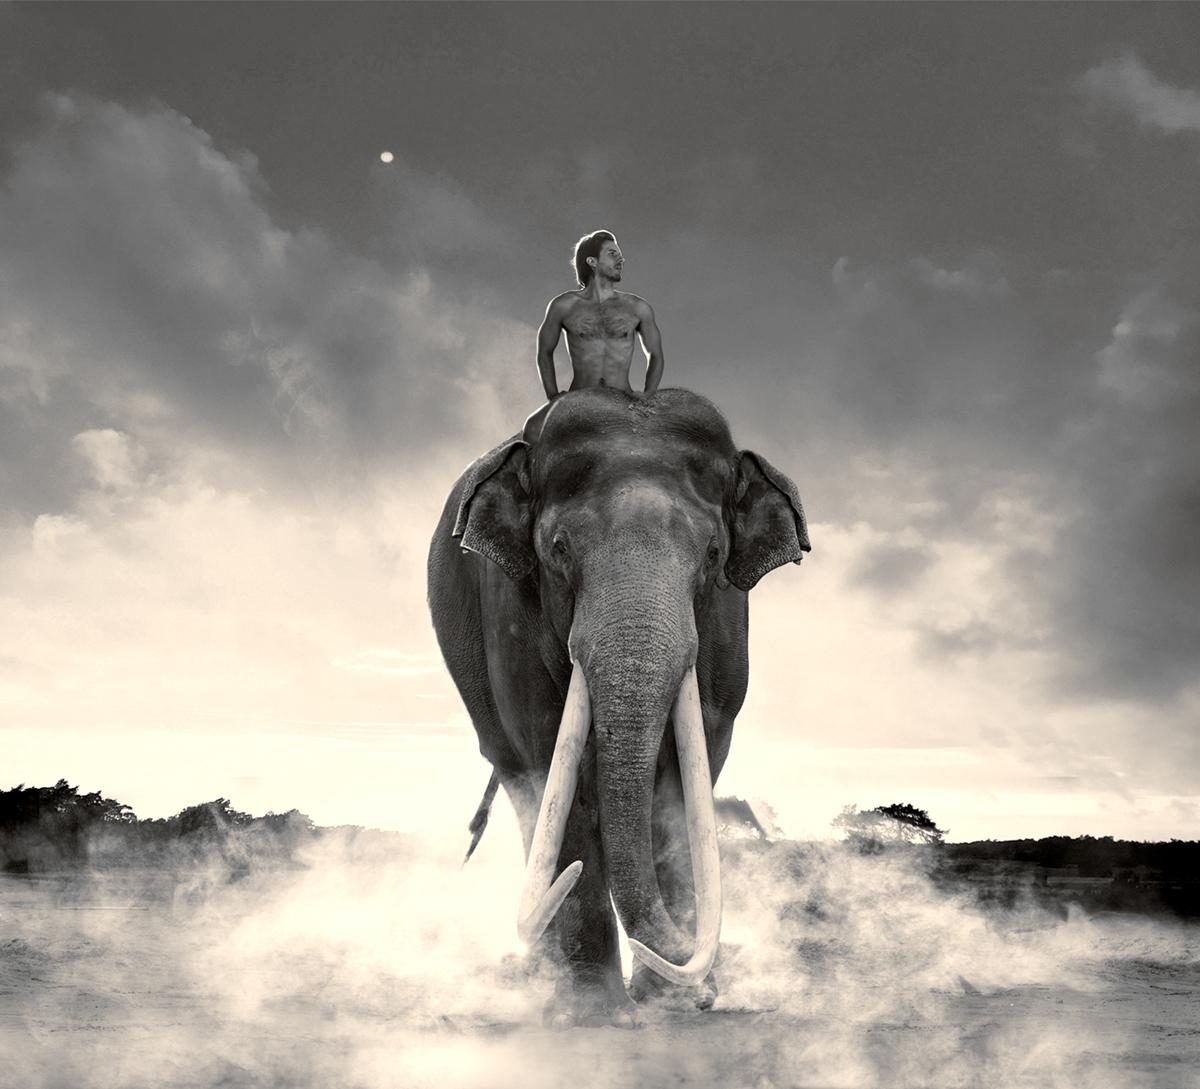 nude man riding on an elephant towards the camera